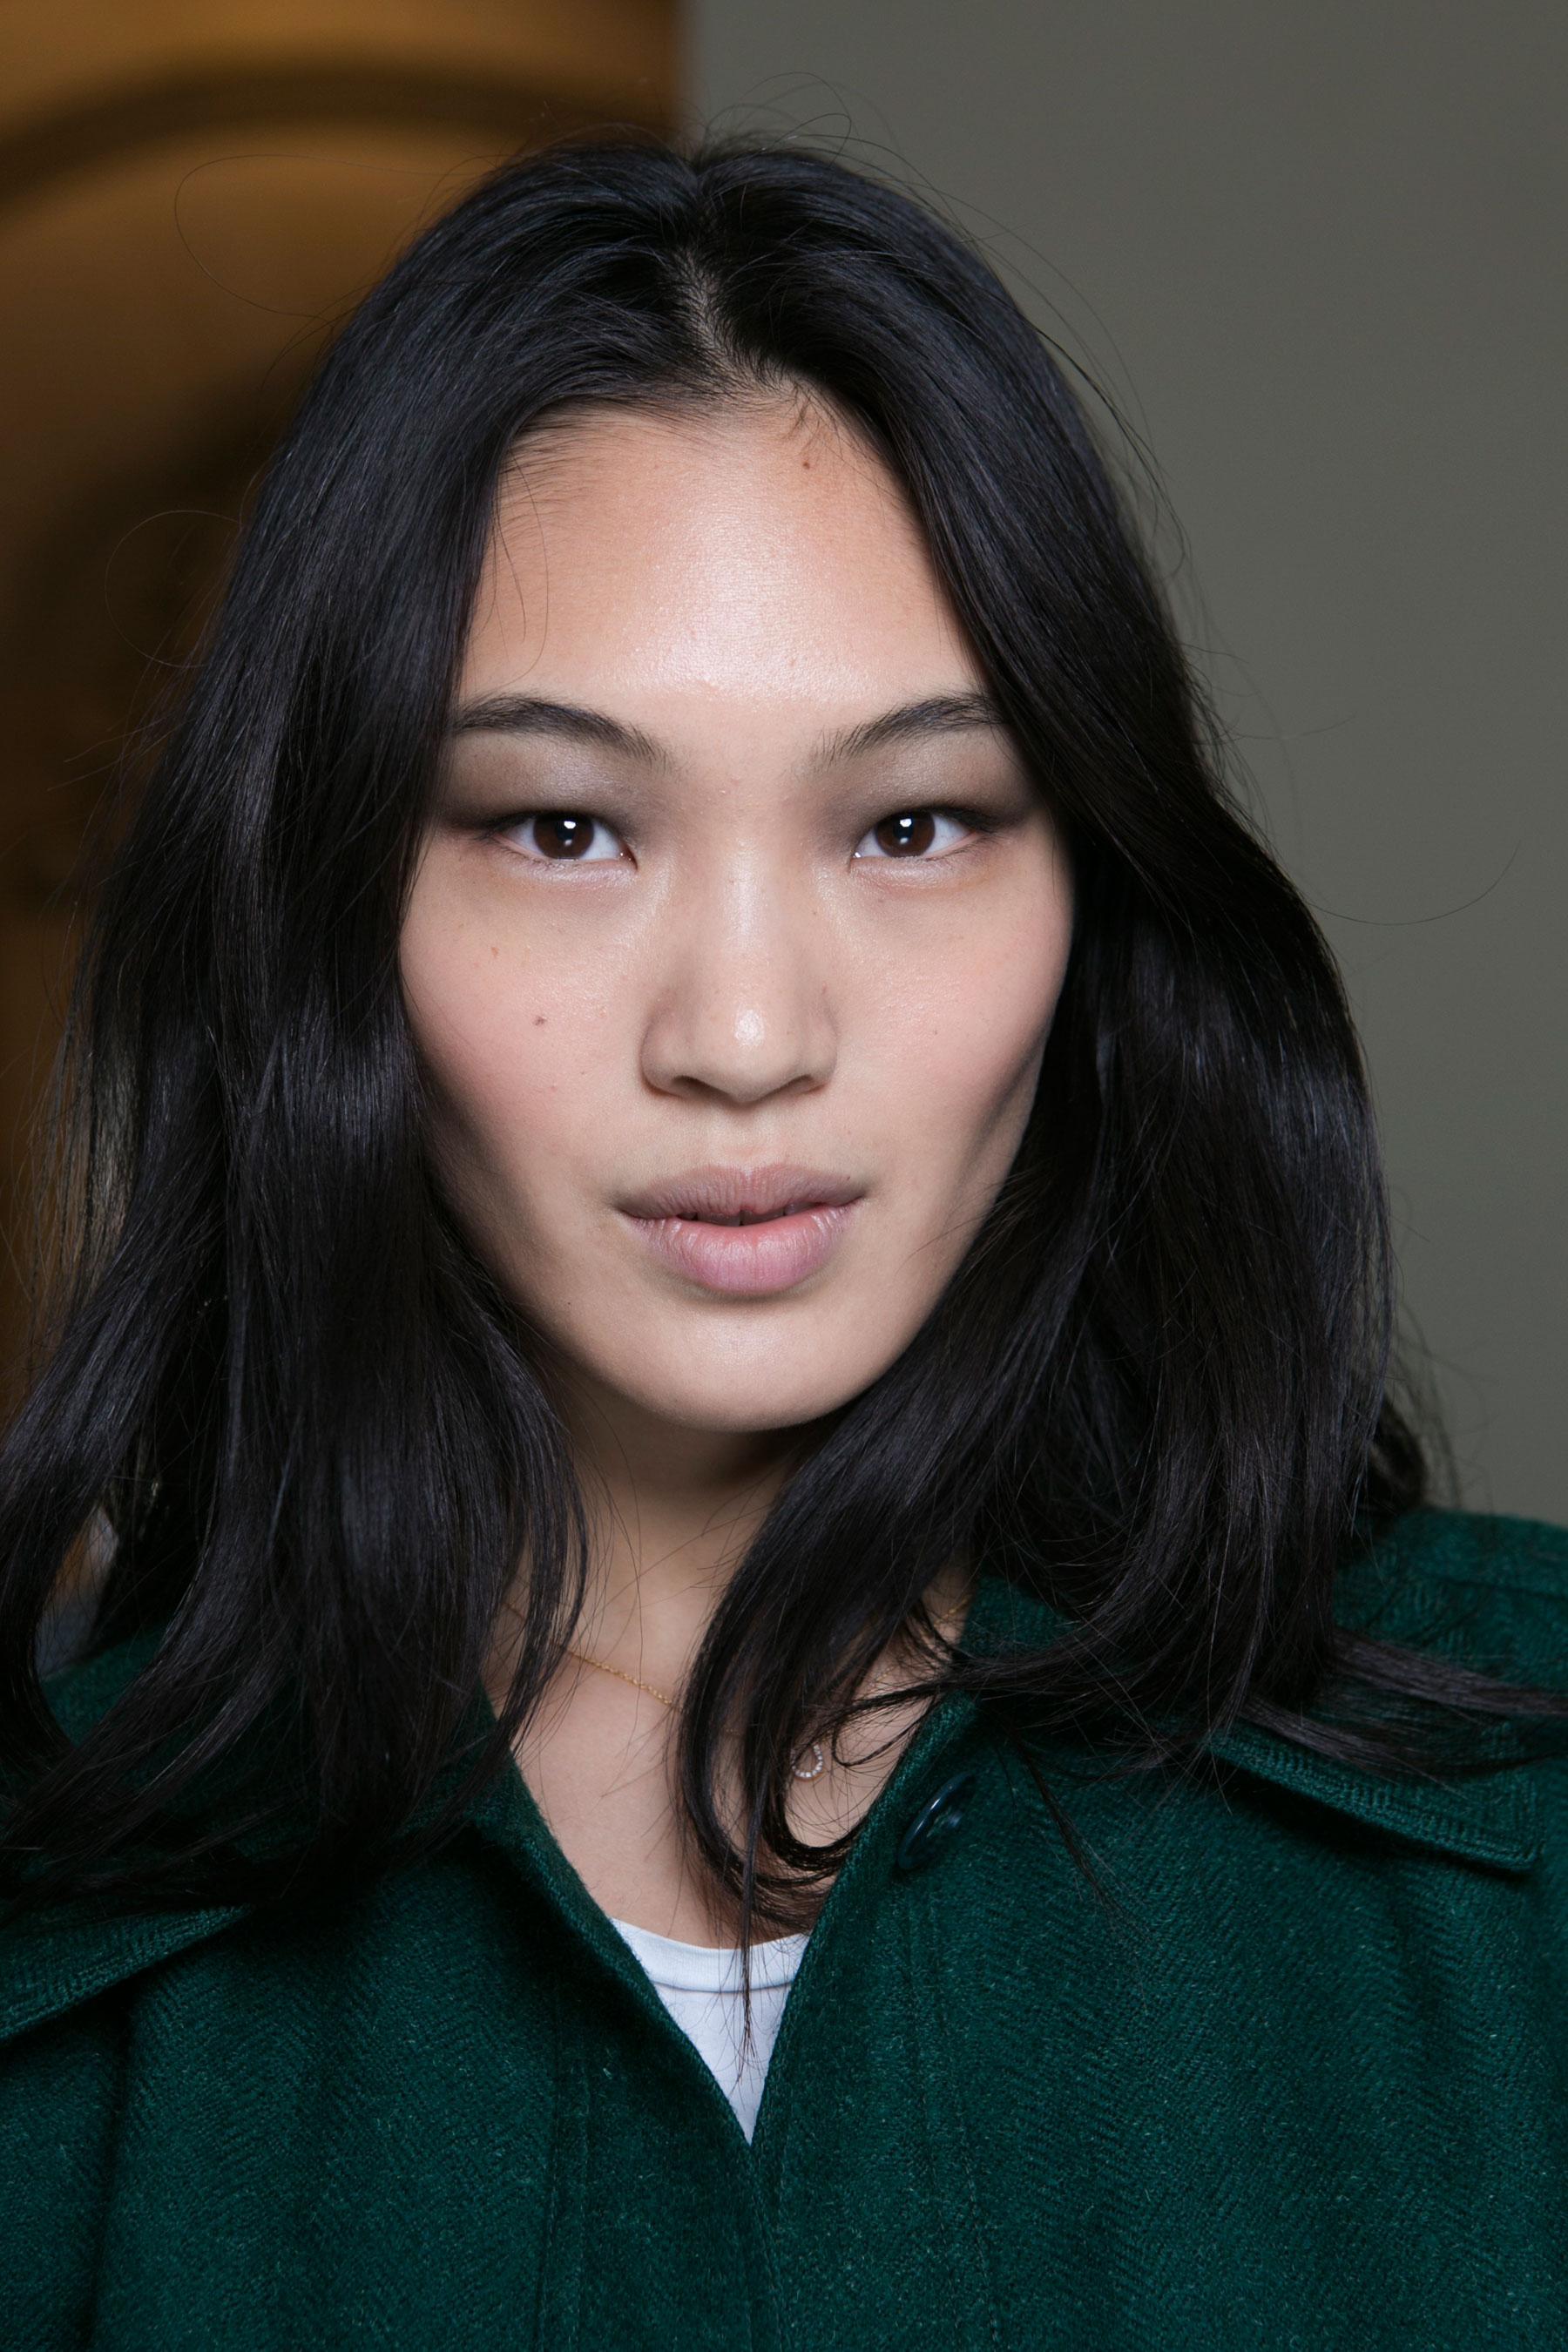 Barbara-Bui-spring-2016-beauty-fashion-show-the-impression-05